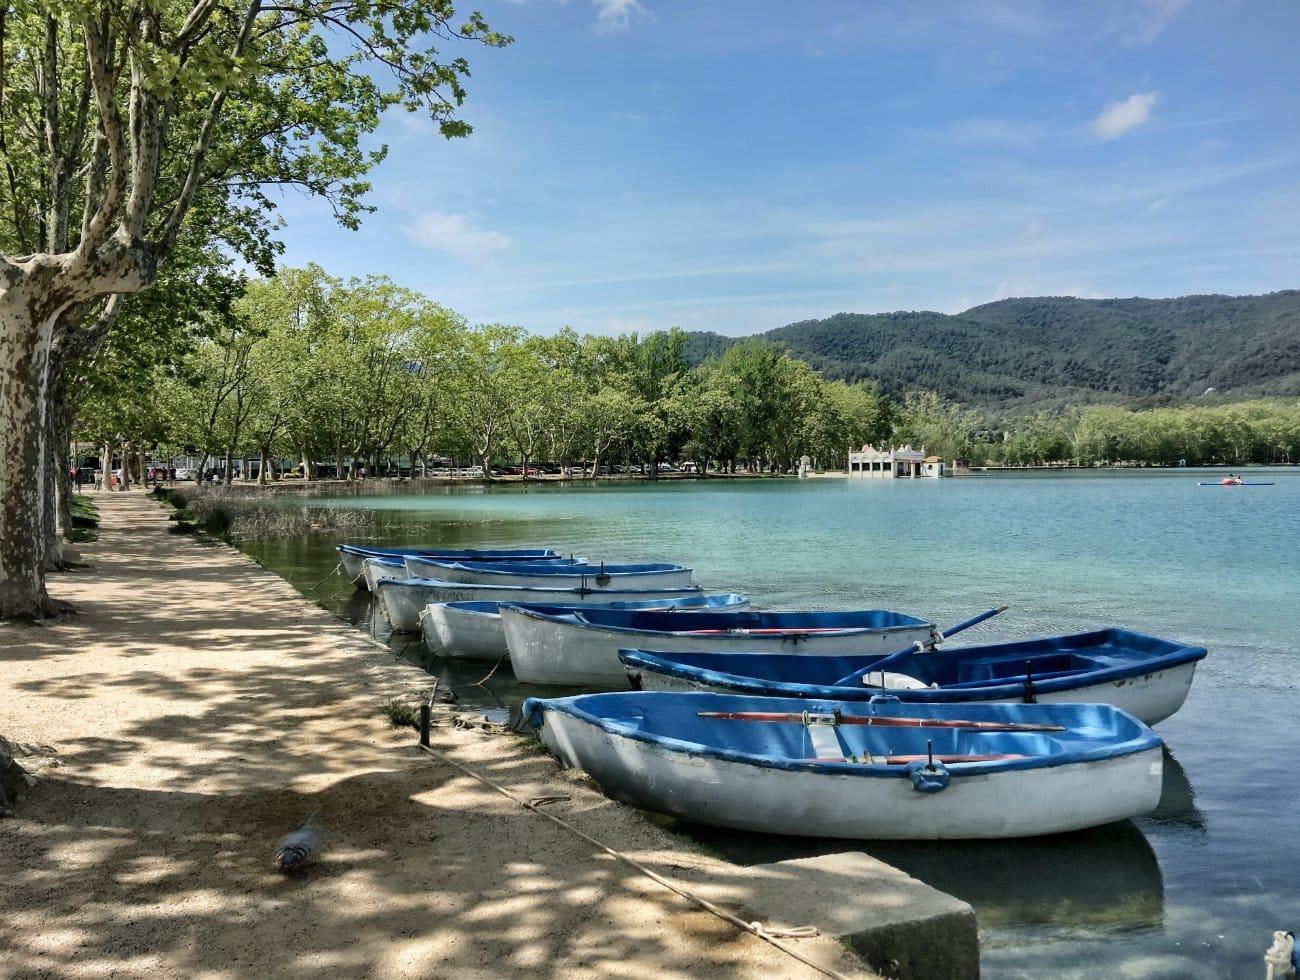 Qué ver en Cataluña: Lago de Banyoles, Girona